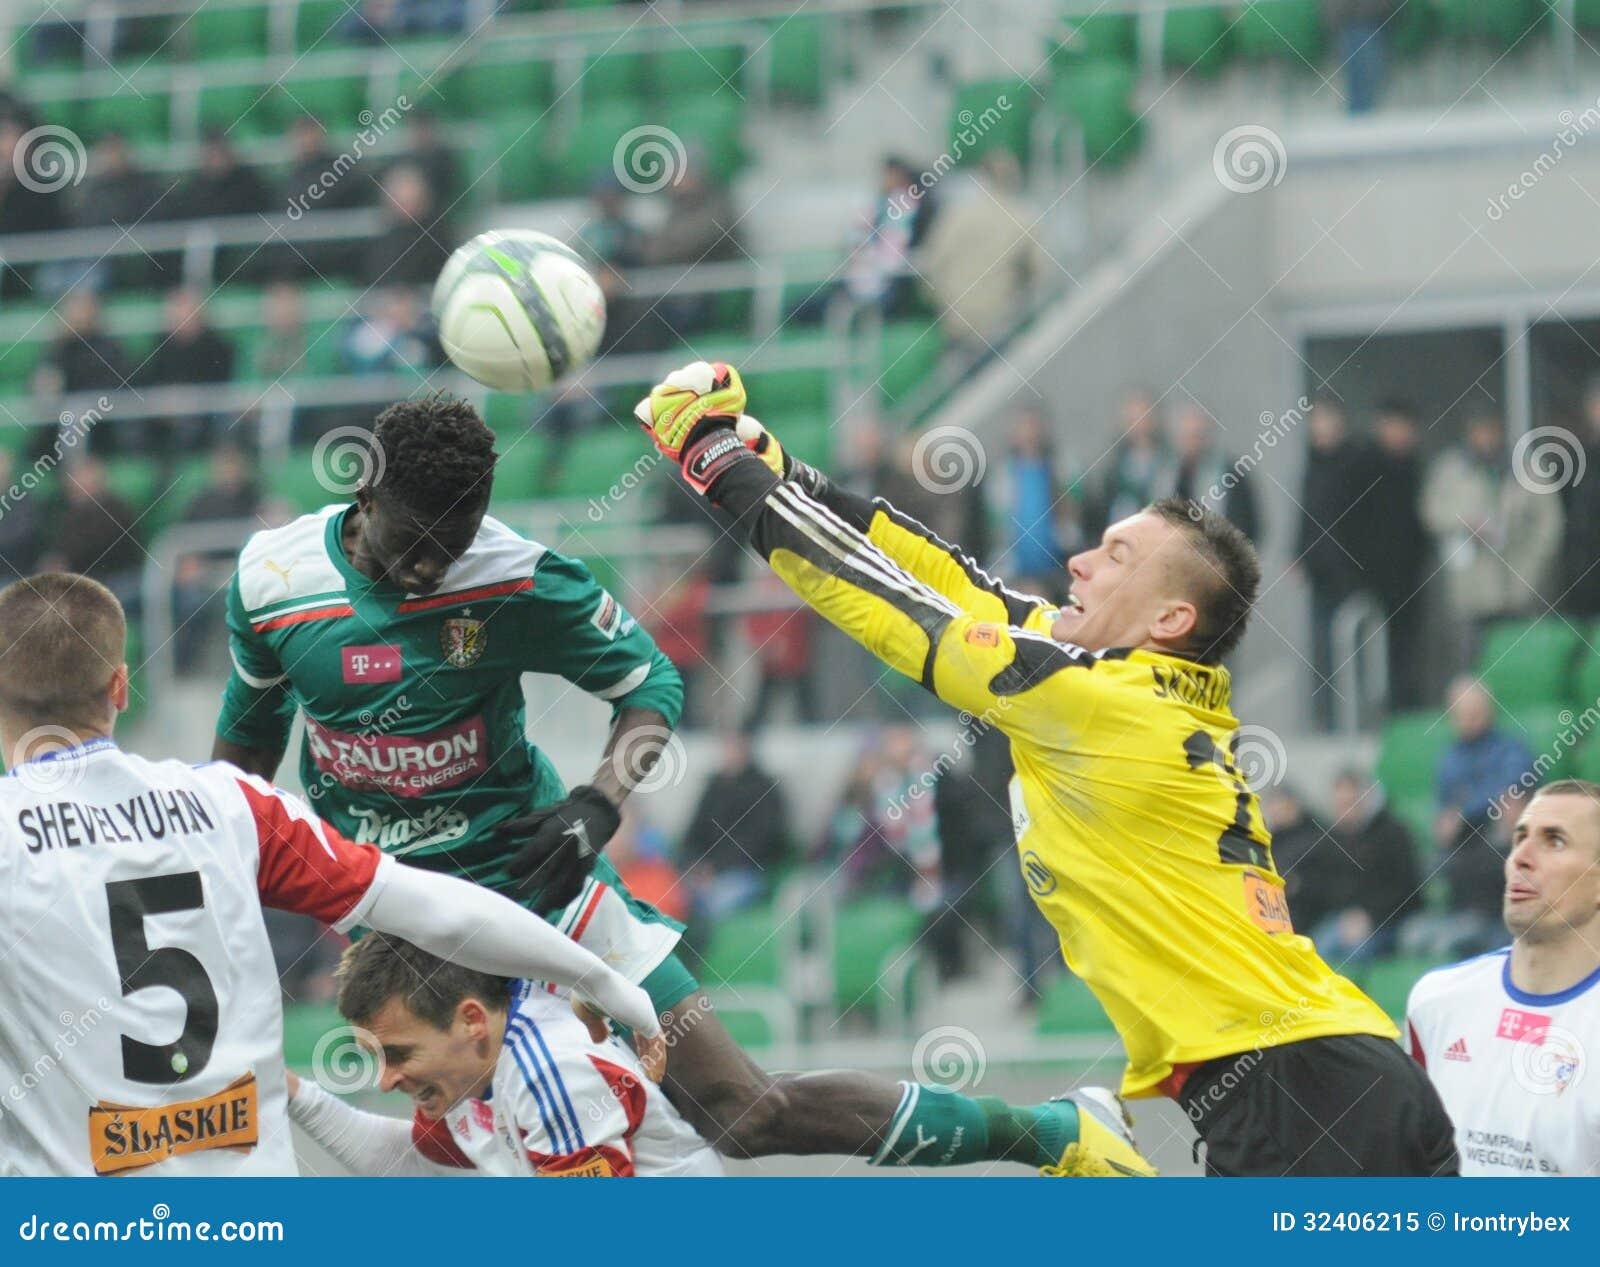 Gornik Zabrze: April 06: Skorupski Fists The Ball Away